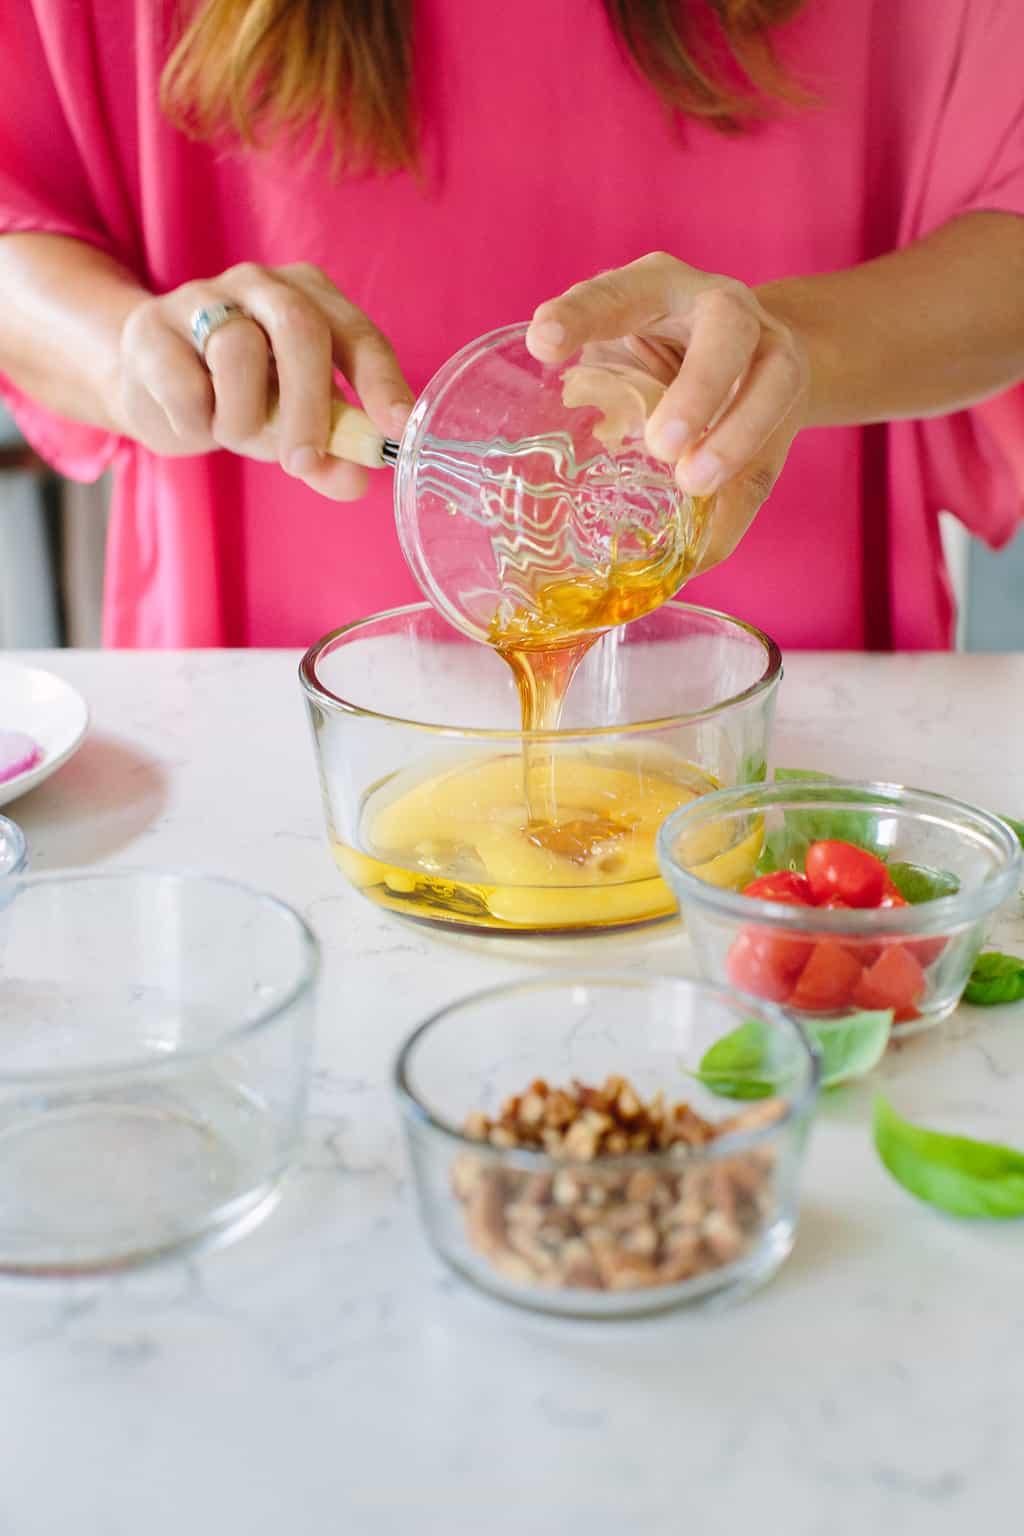 Citrus-Honey-Vinaigrette-Salad-Dressing-directions